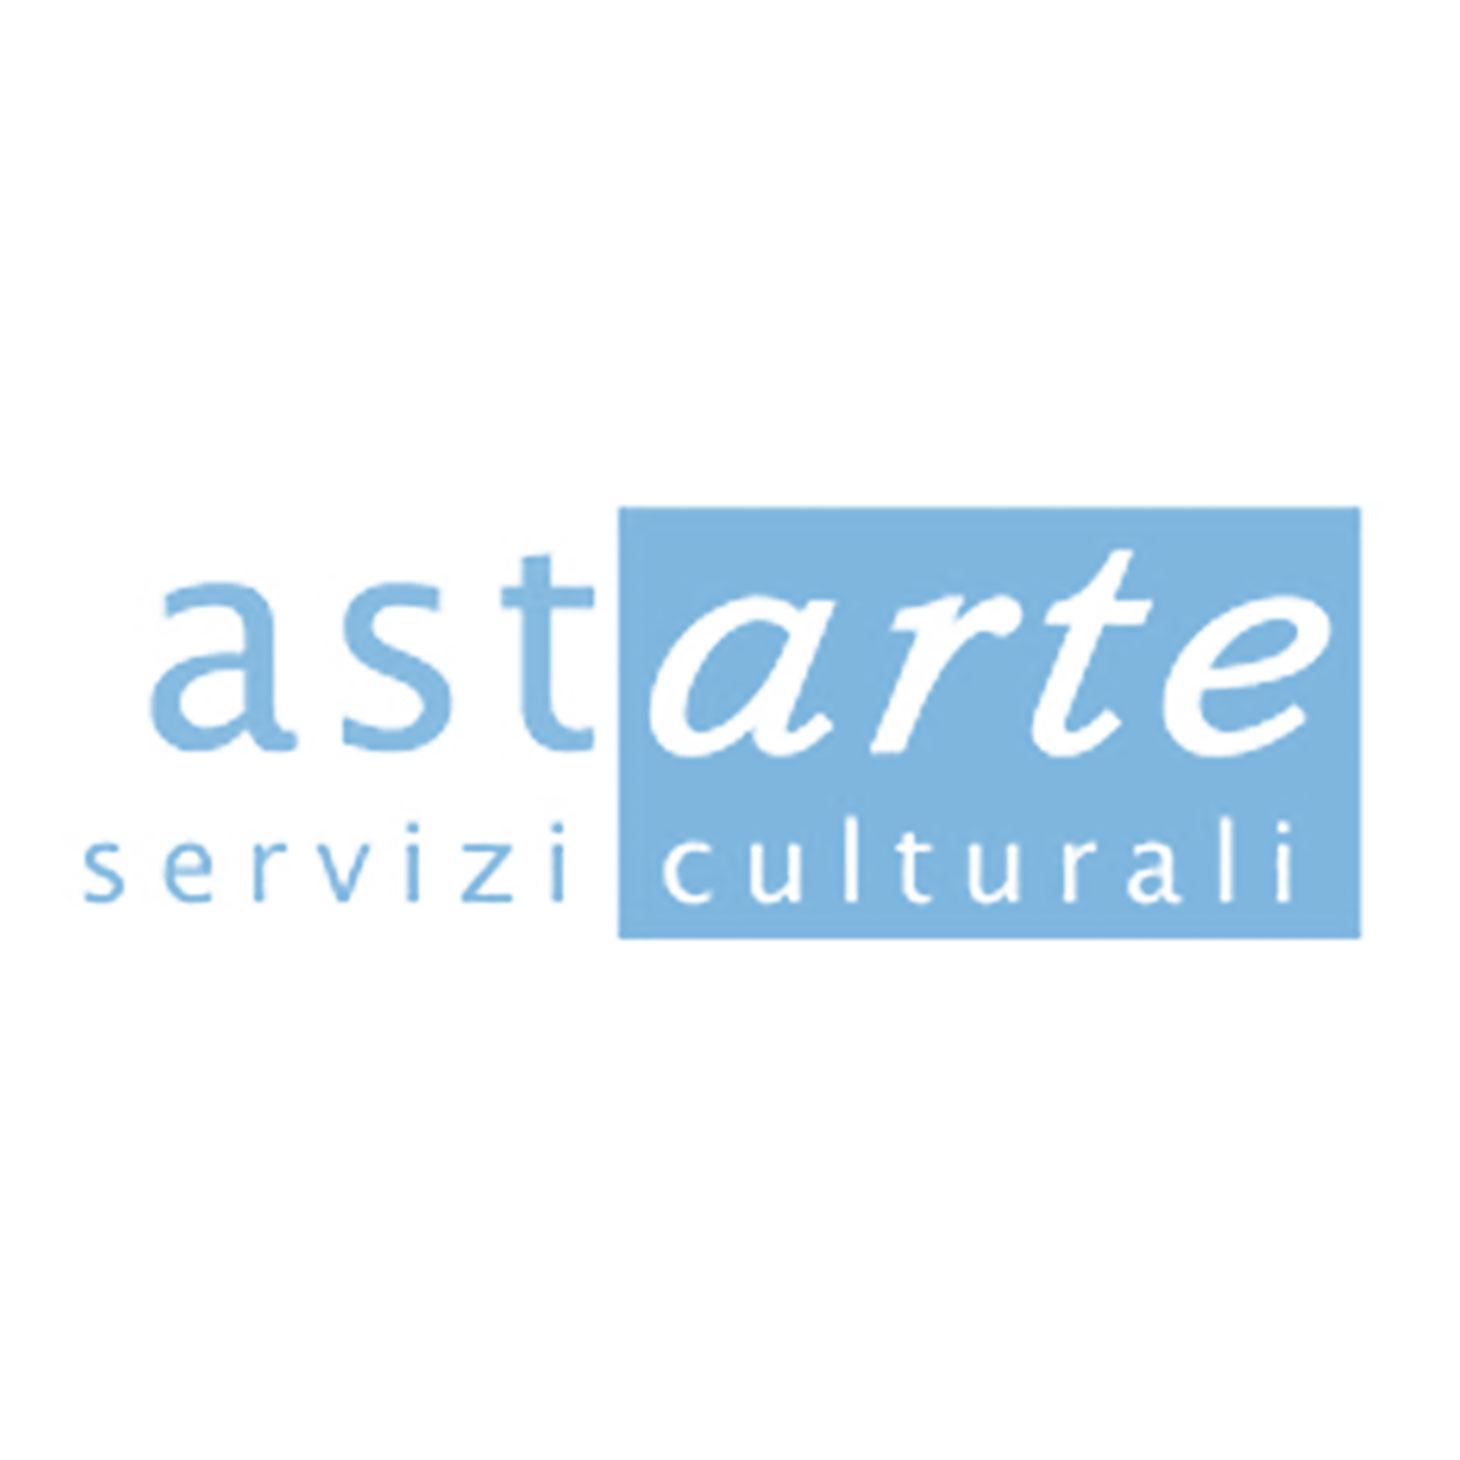 Astarte